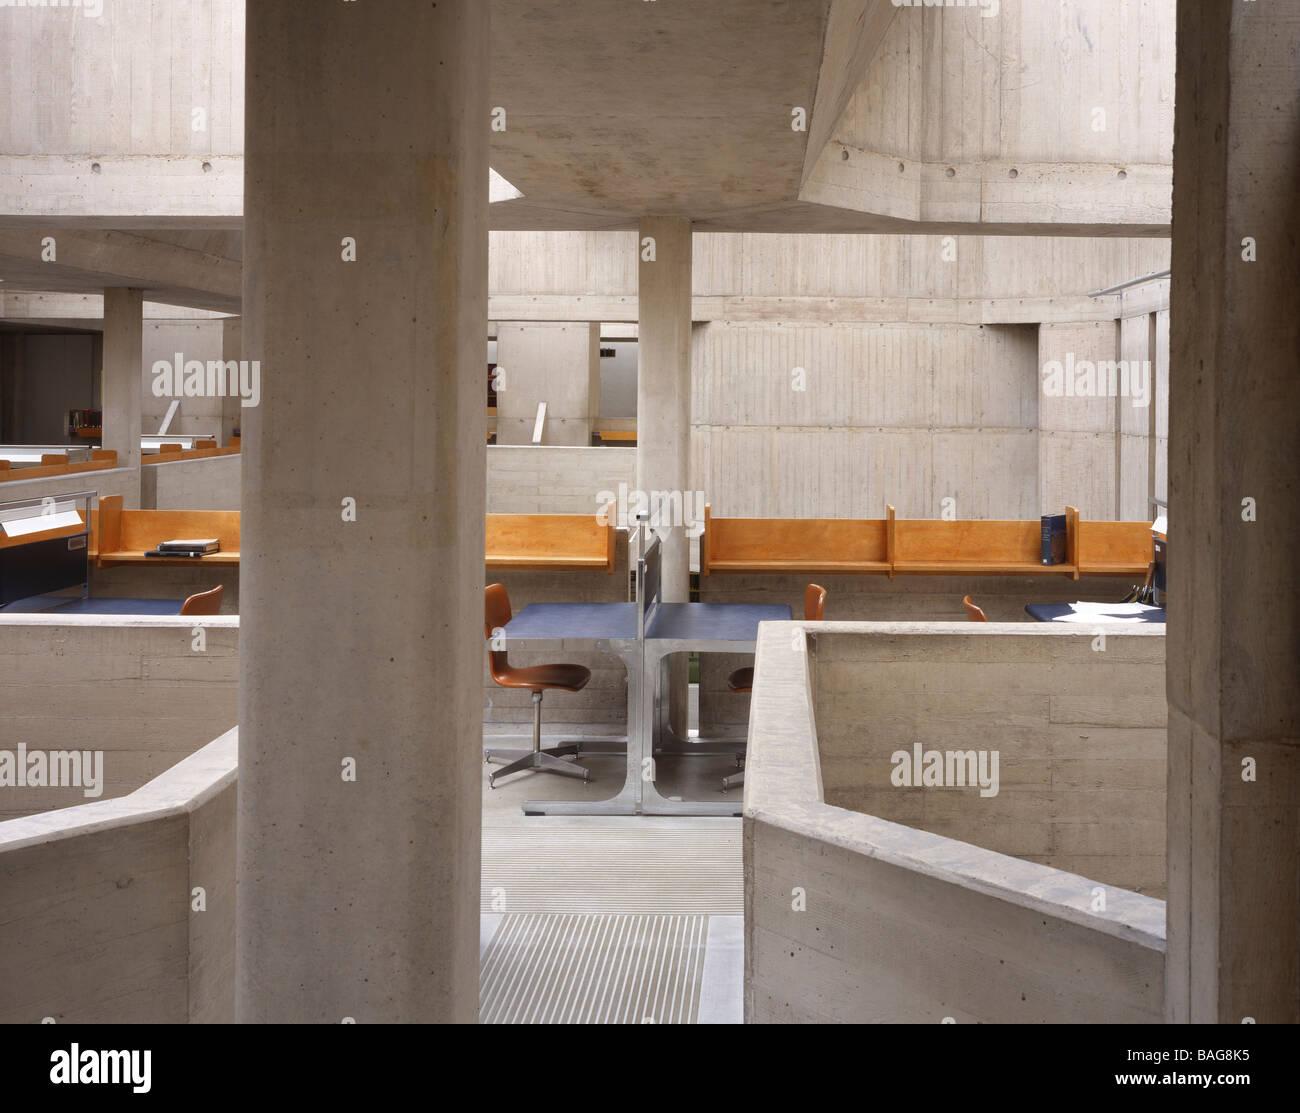 Berkeley Bibliothek Trinity College Dublin Irland Abk Architekten